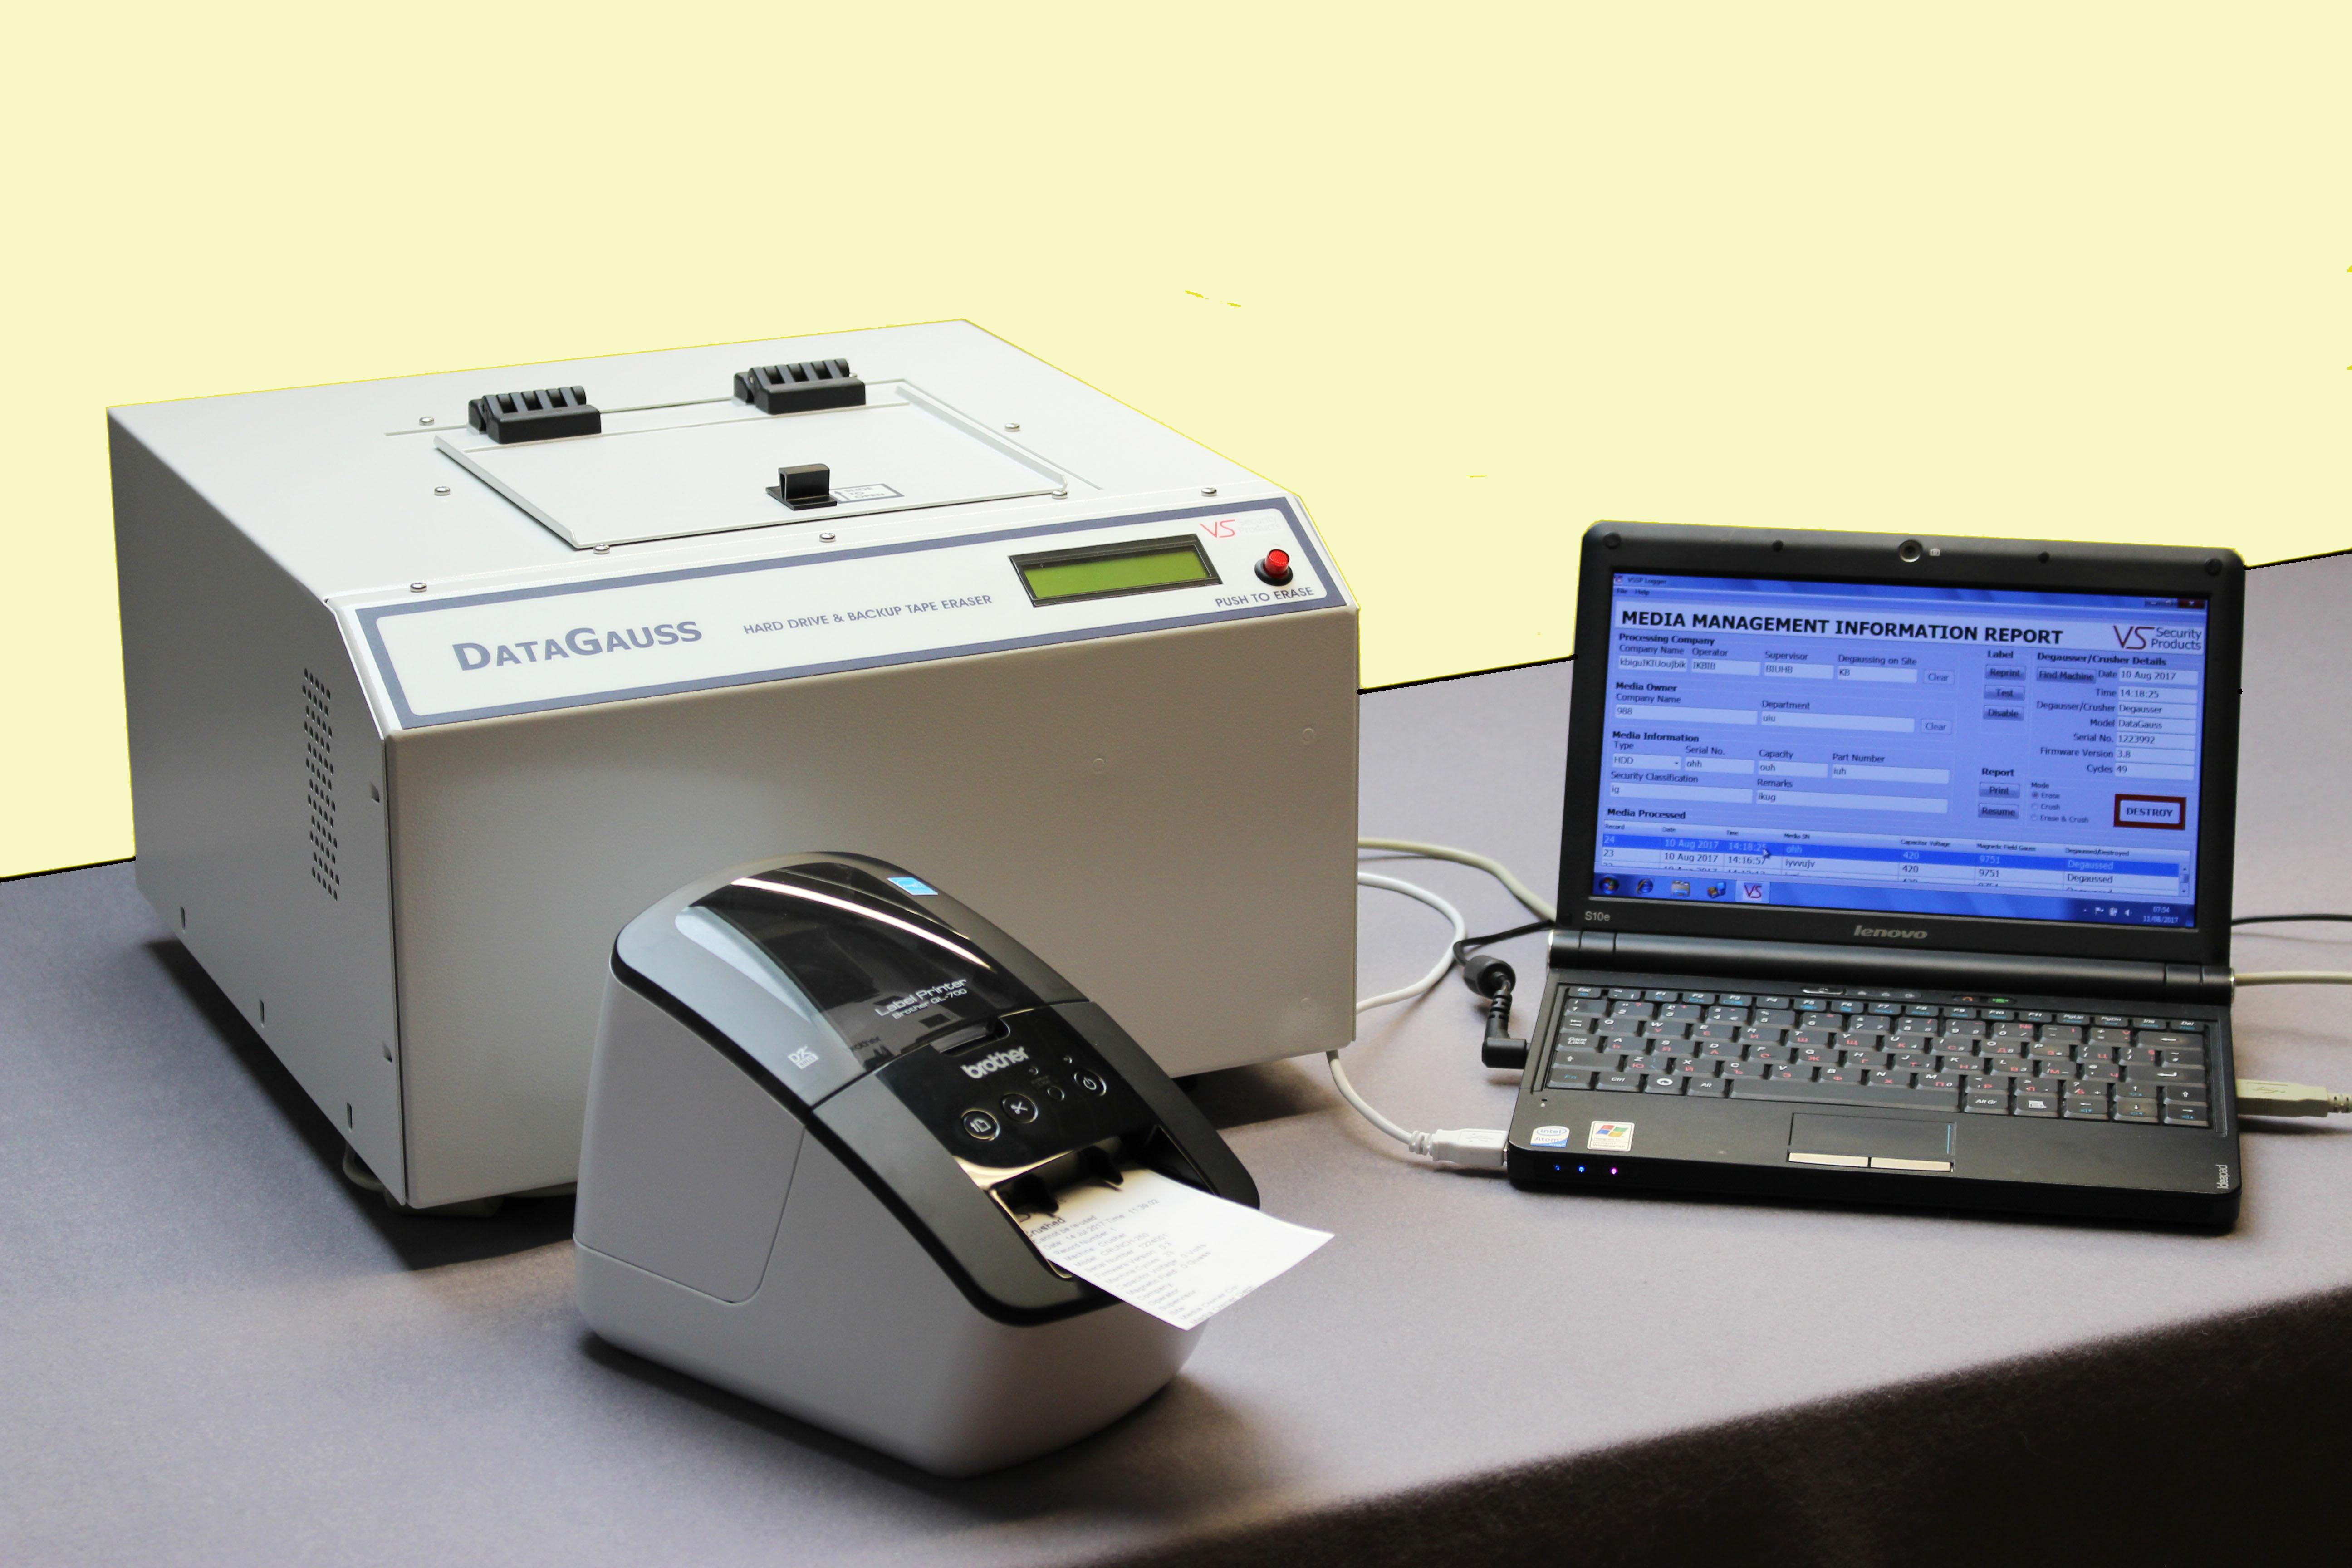 datagauss-lg-degaussing-equipment-for-hard-drives